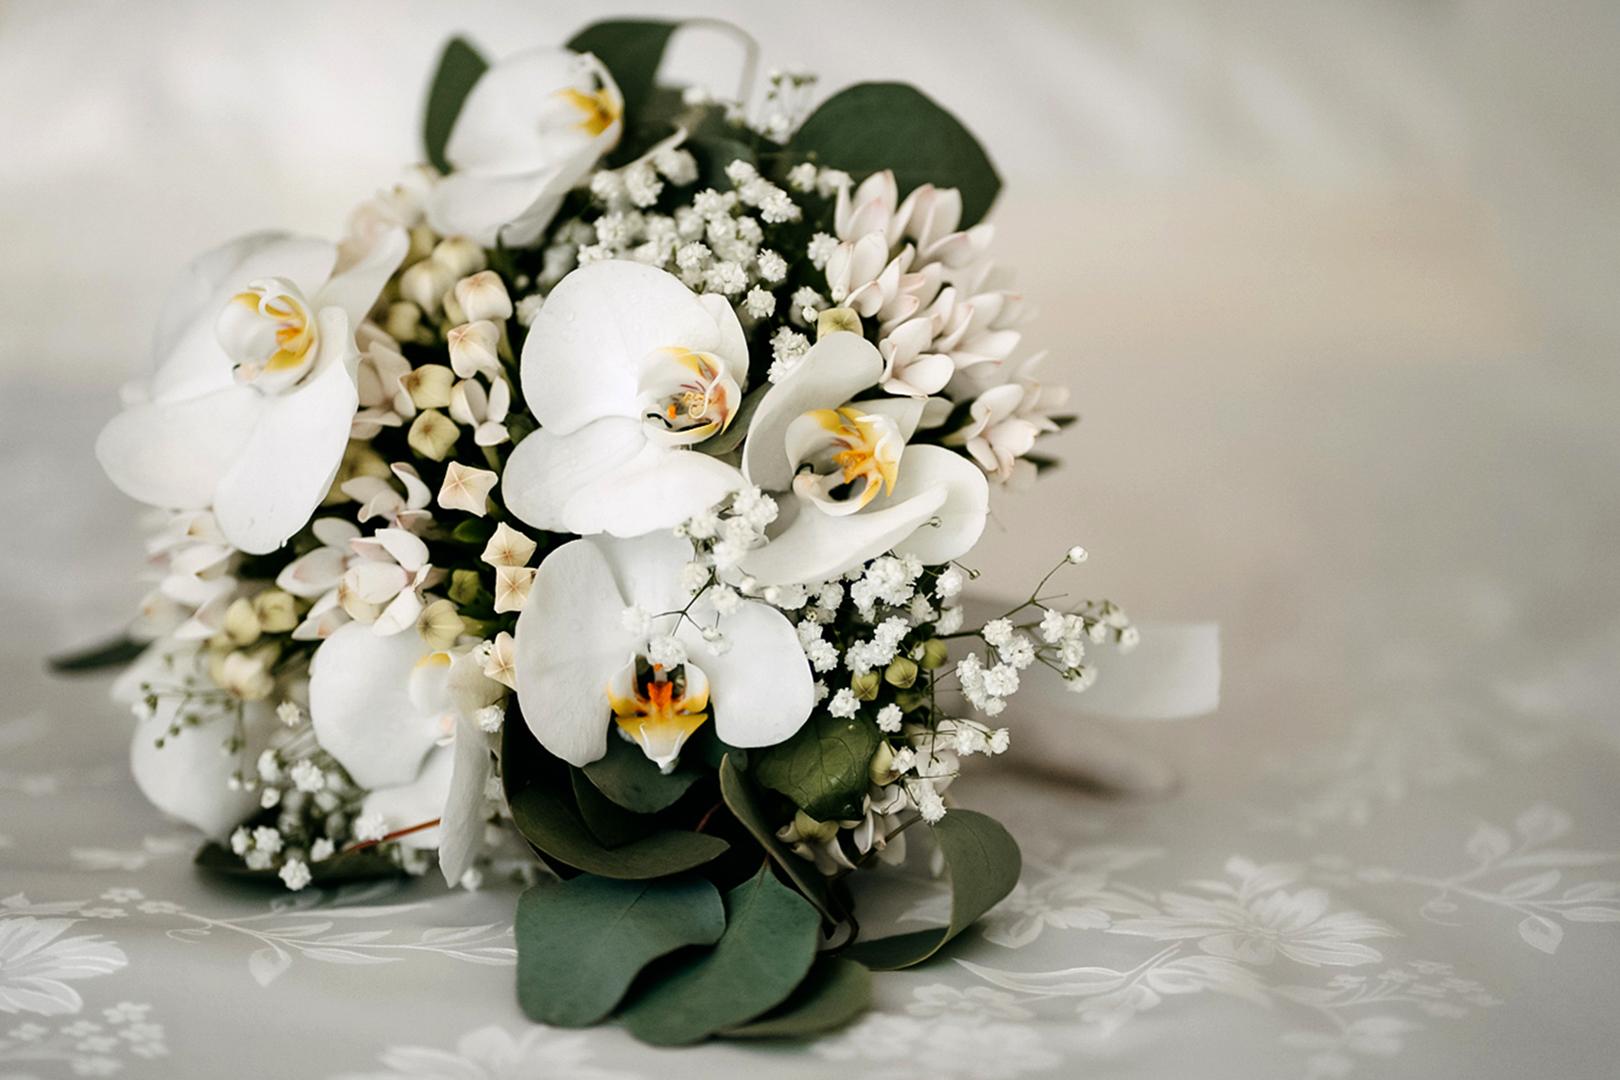 5 gianni-lepore-bouquet-sposa